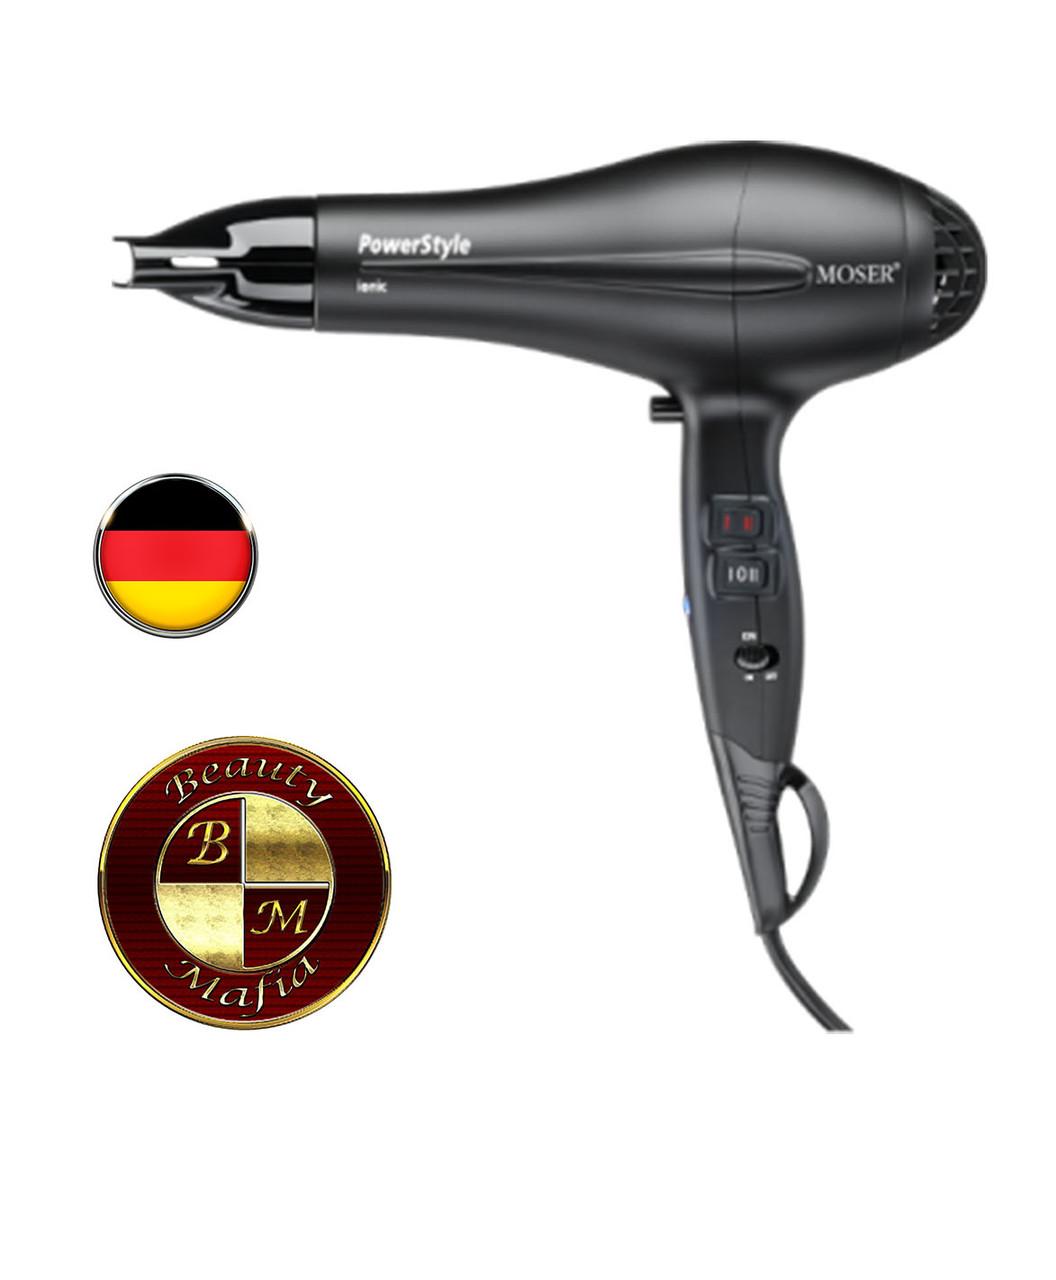 Фен для волос Moser PowerStyle ionic, 2000 W